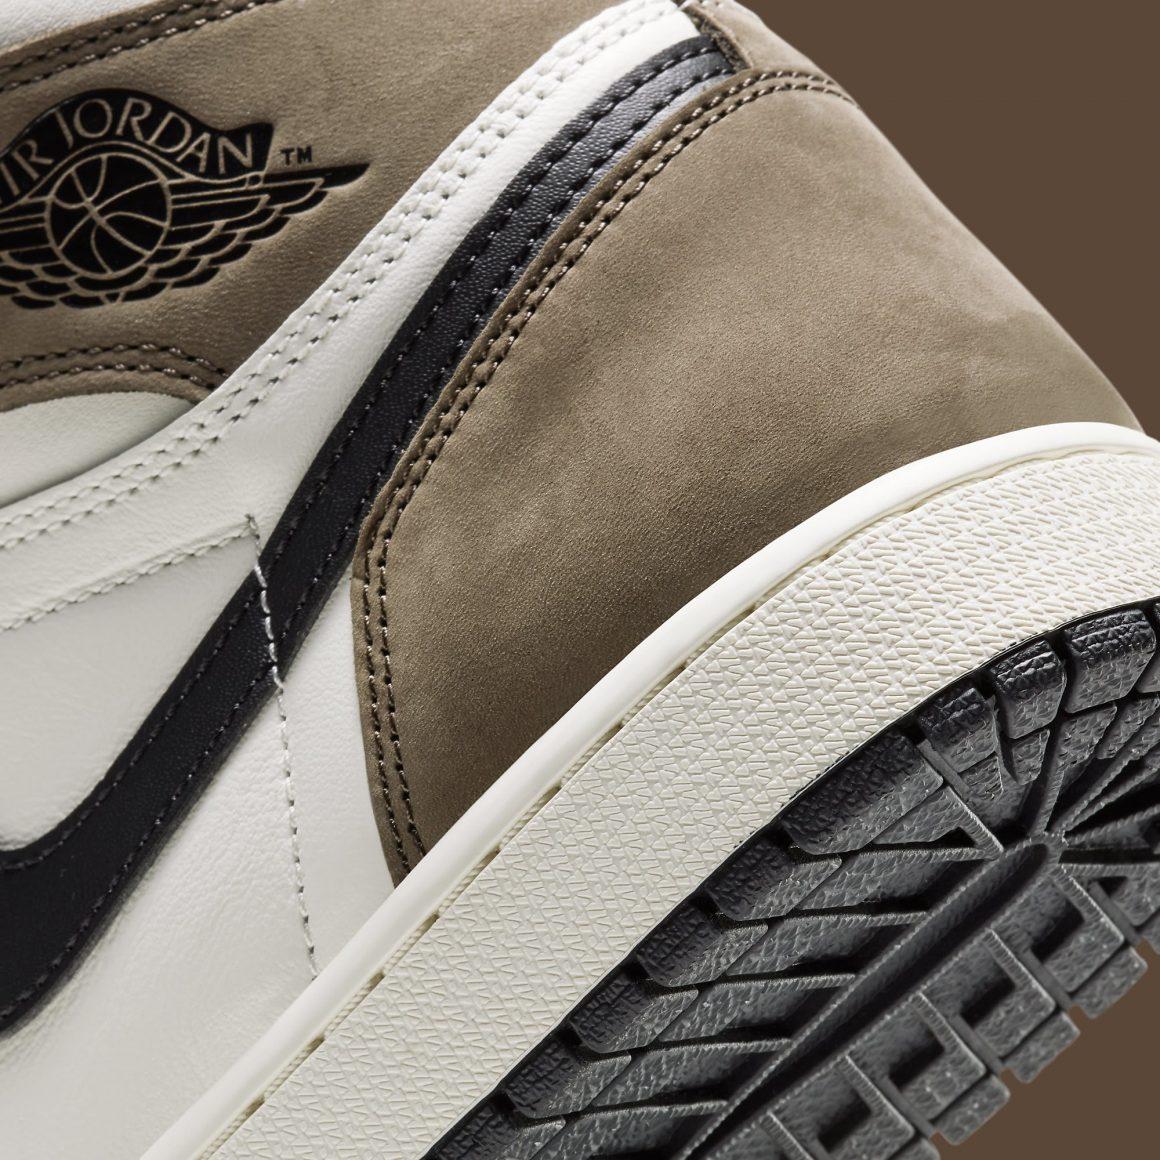 Air Jordan 1 Retro High OG ''Dark Mocha'' - 555088-105